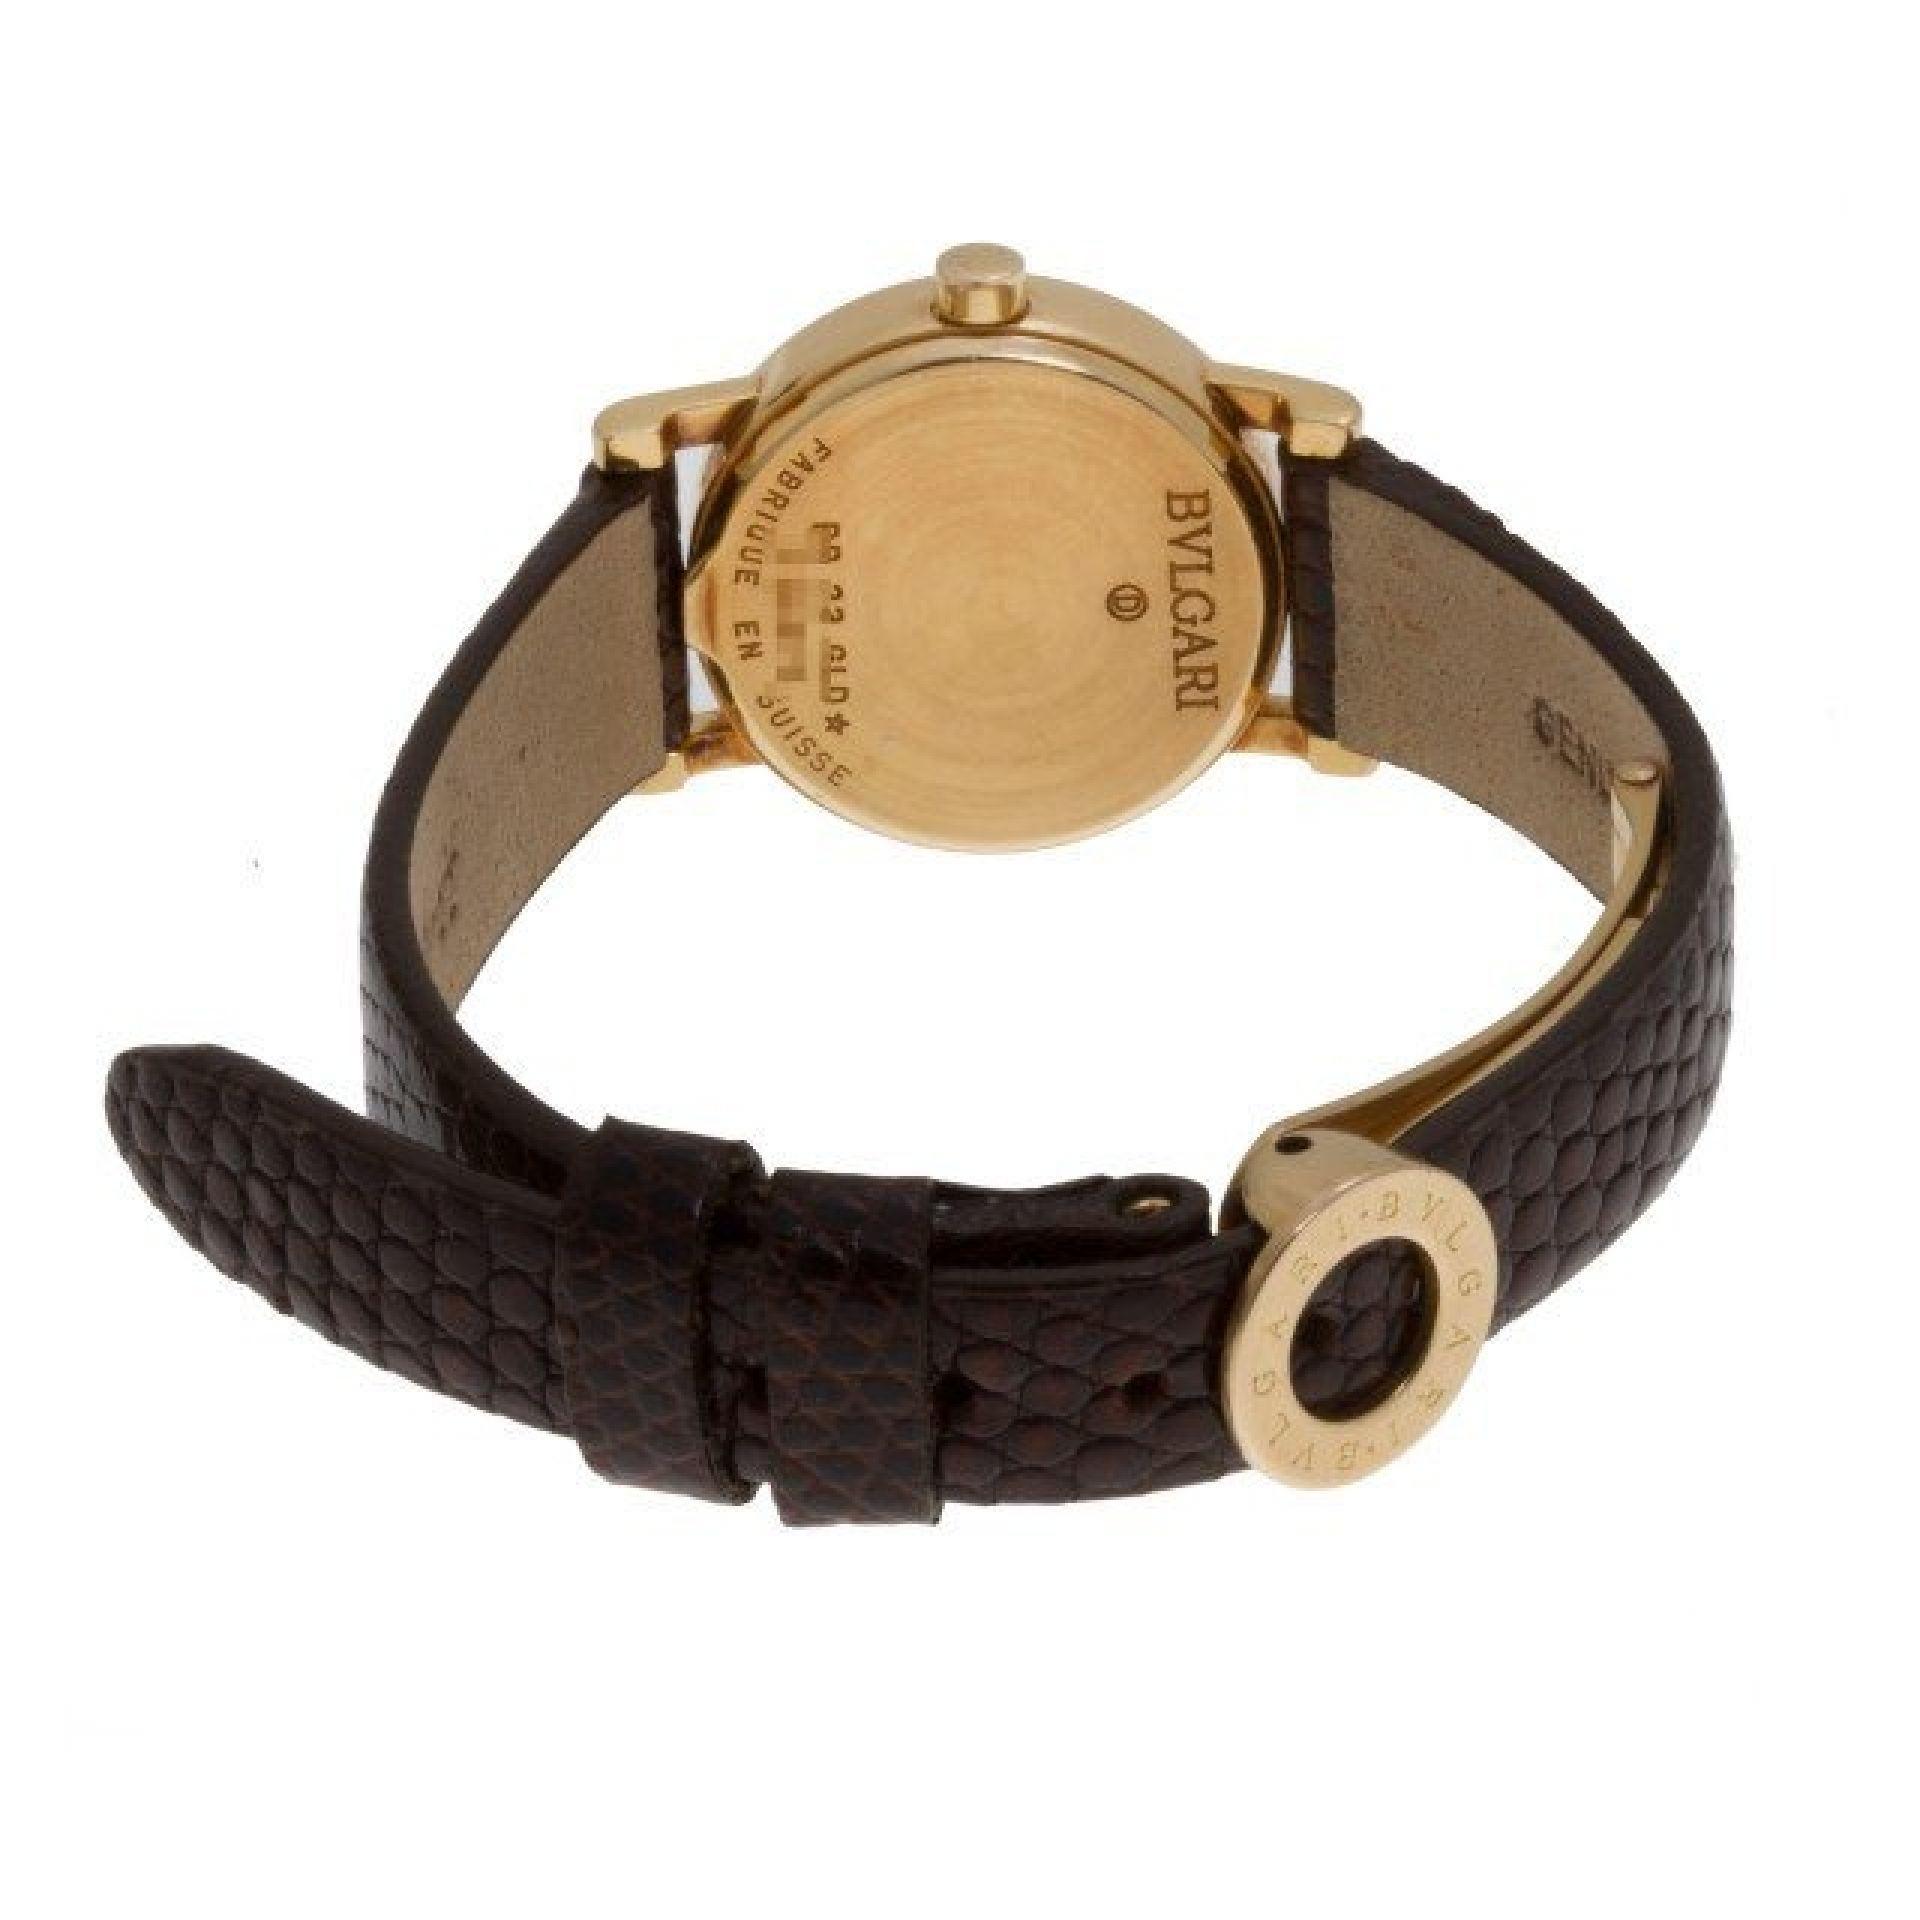 Bvlgari Bvlgari BB23GLD 18k yellow gold Black dial 23mm Quartz watch